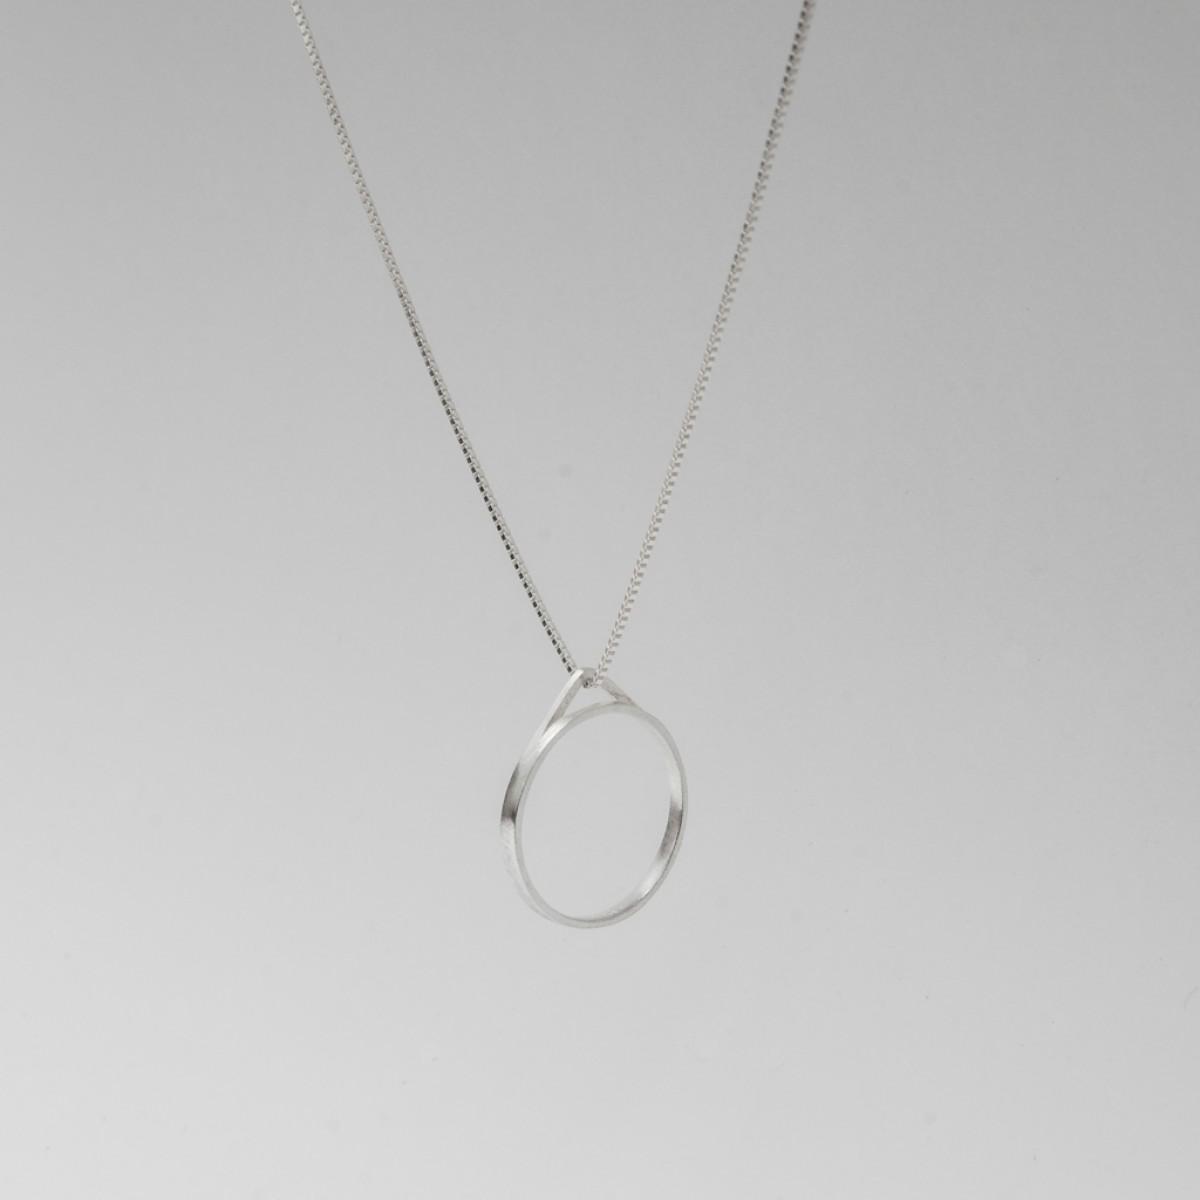 Jonathan Radetz Jewellery, Kette TRI, Länge 43cm, Silber 925